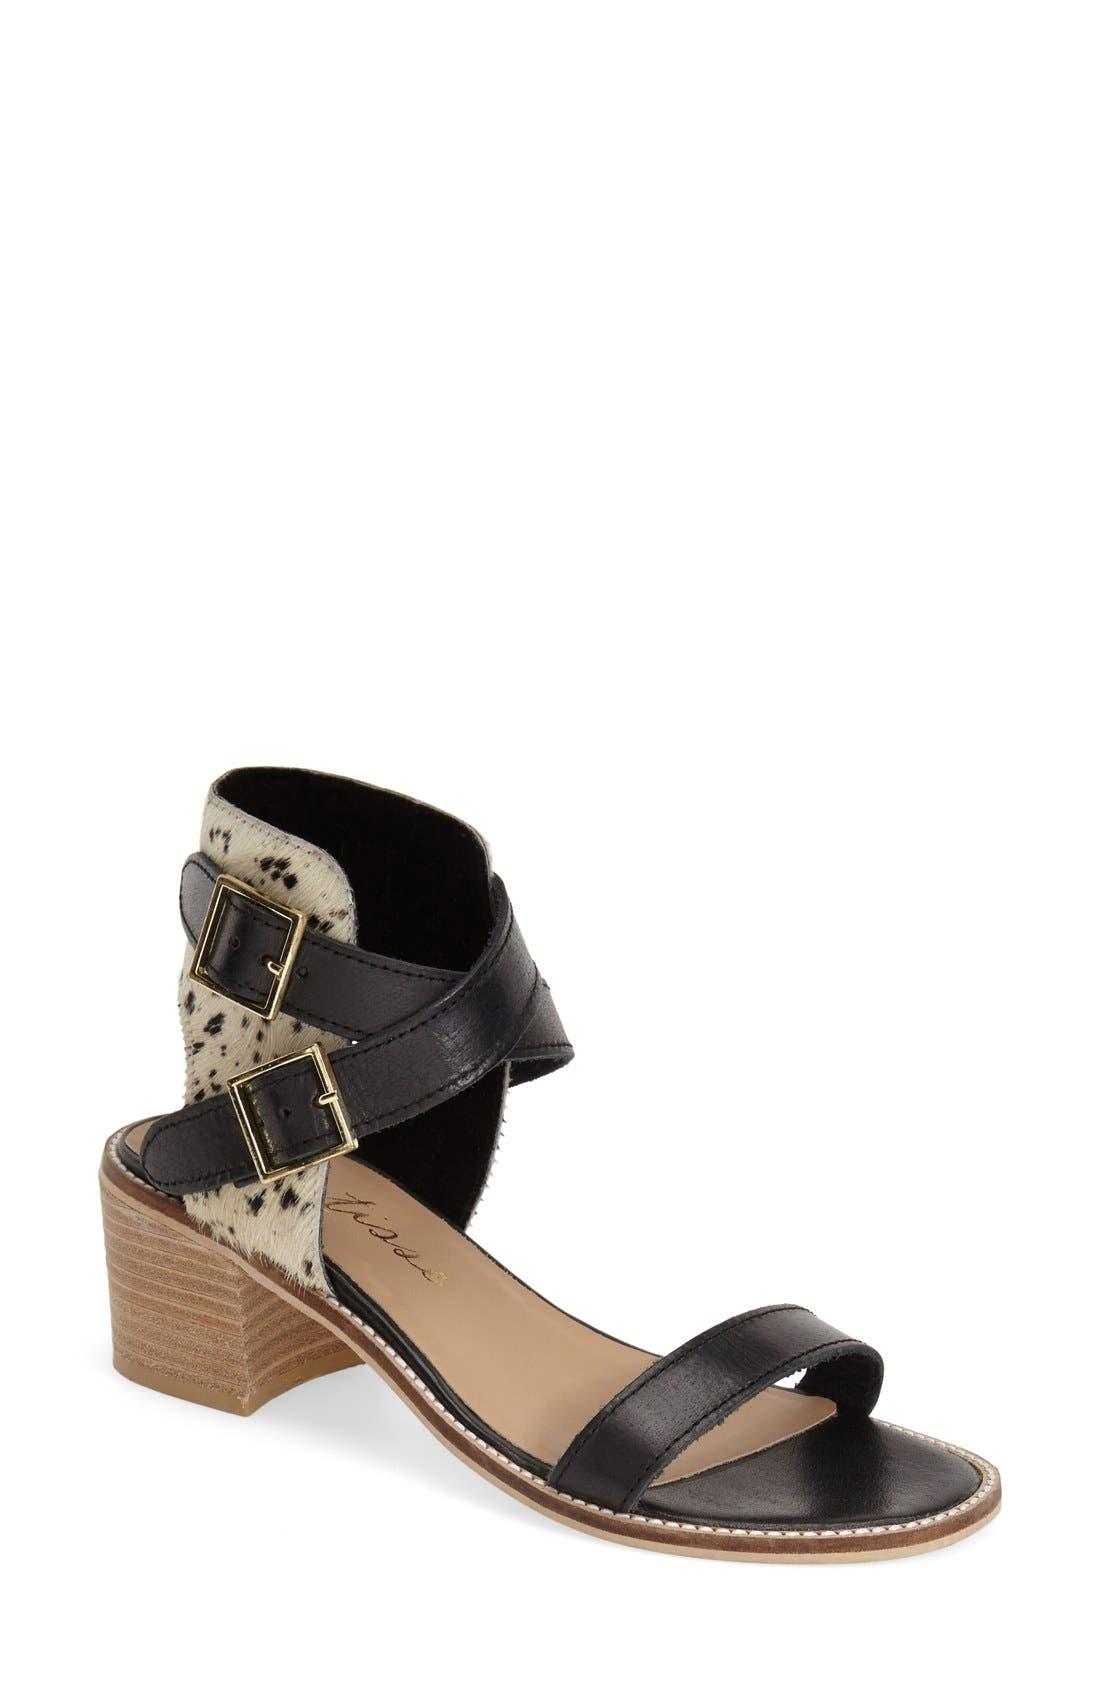 Main Image - Matisse 'Orin' Sandal (Women)